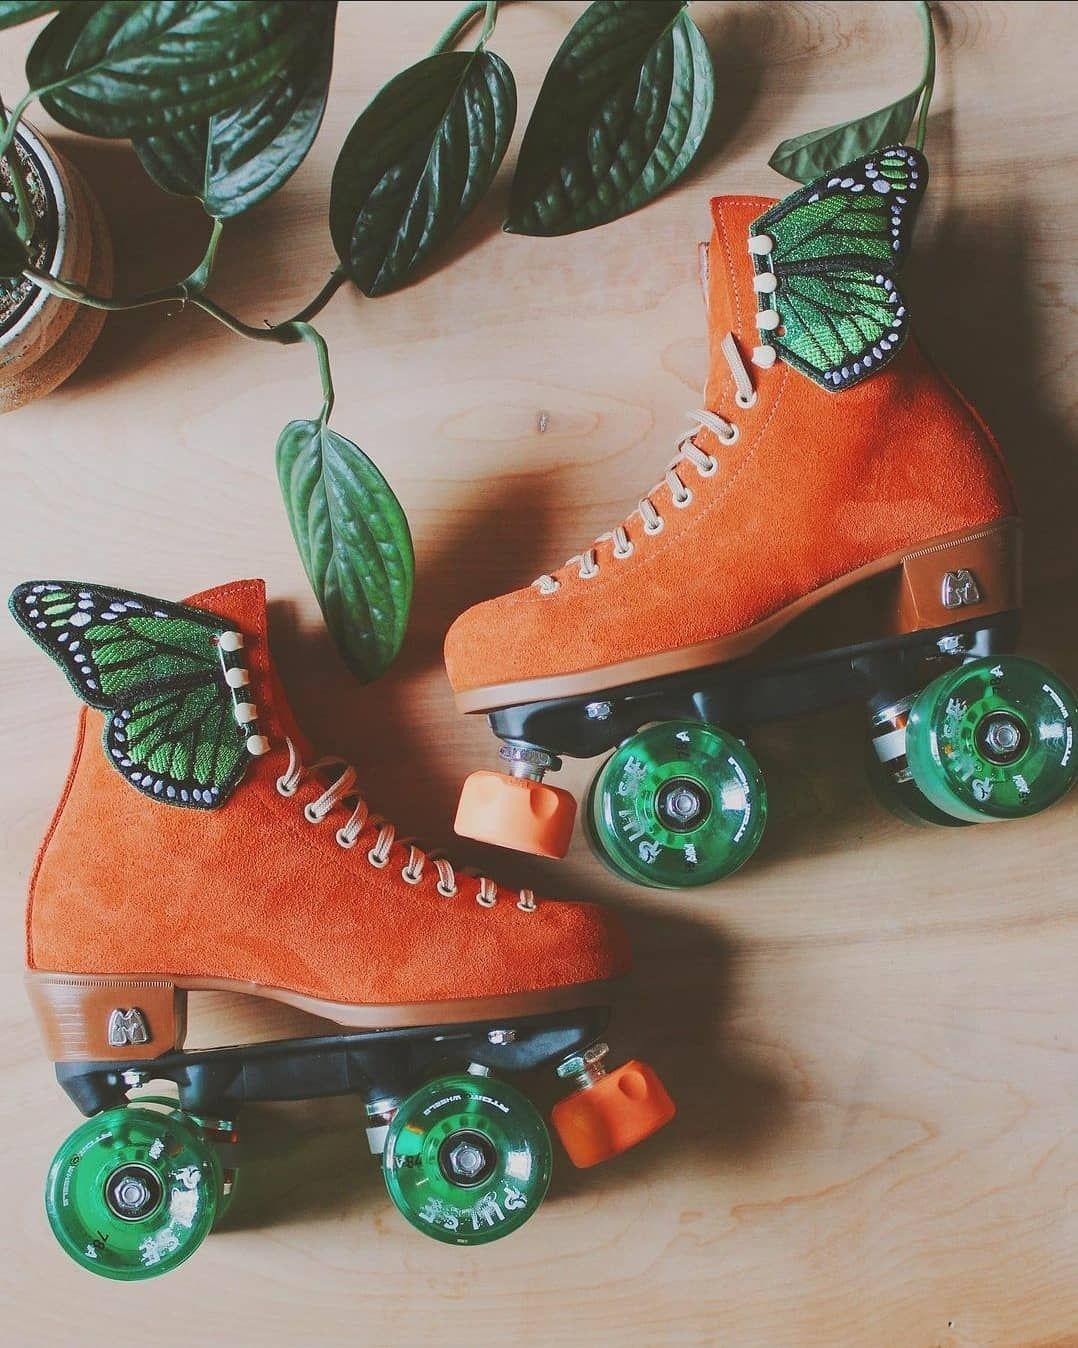 Roller Skate On Instagram Lunasibai Skate Setup This Color Combo Is Beautiful Rol Roller Skating Outfits Roller Skates Vintage Roller Skates Fashion